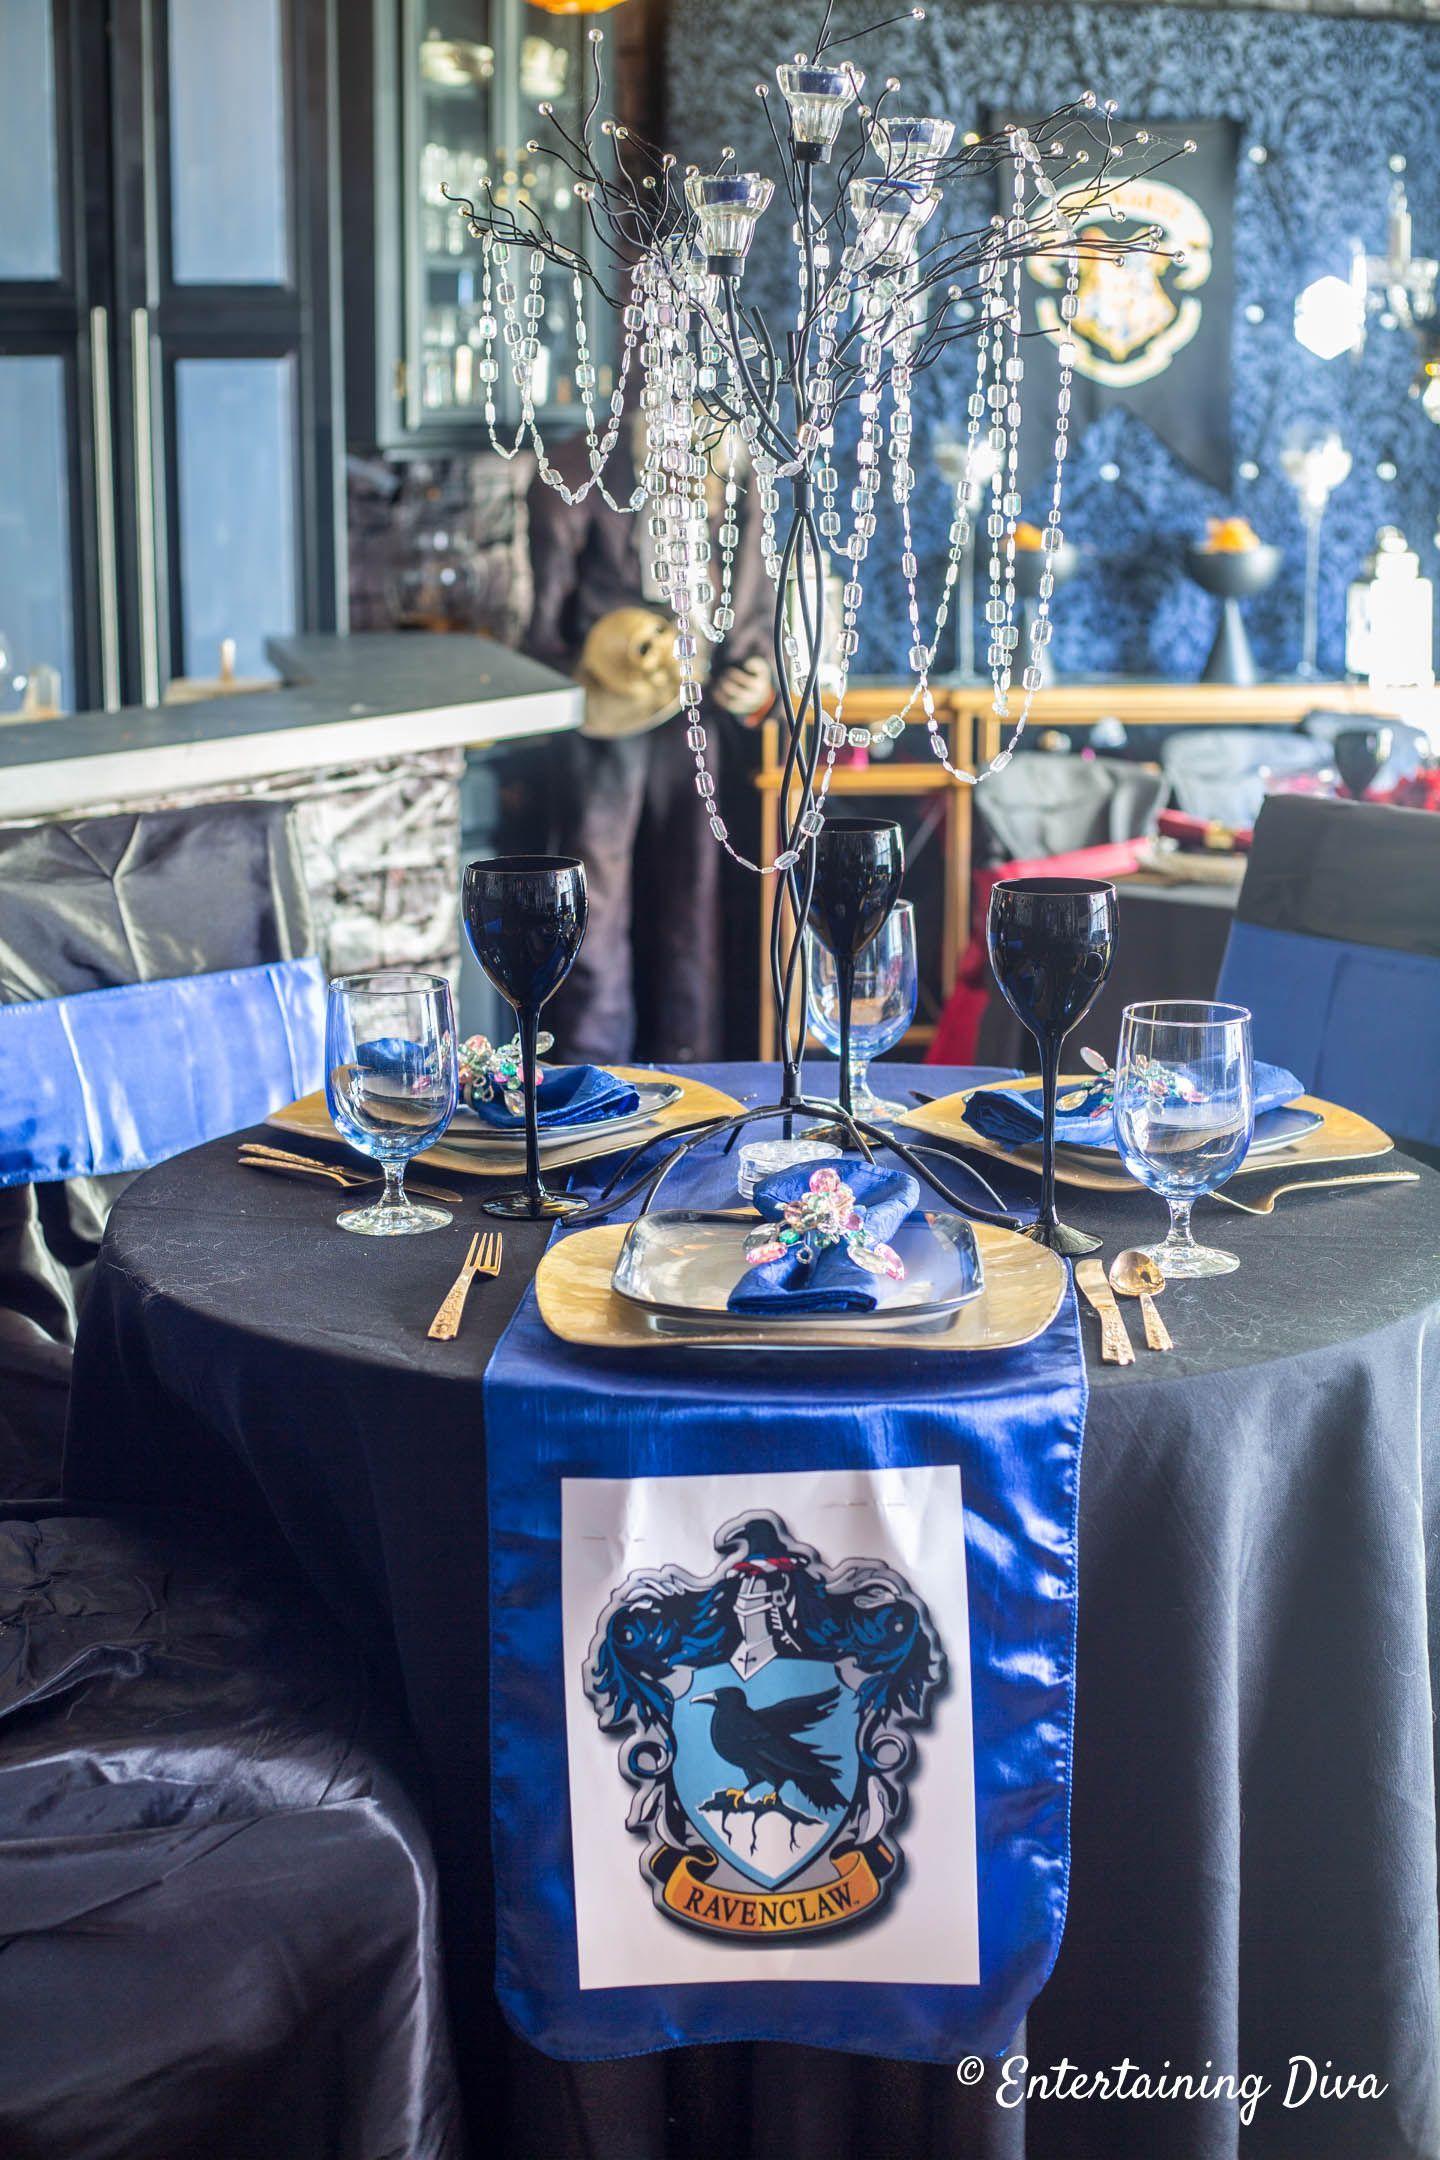 Harry Potter Table Decor Ideas Entertaining Diva From House To Home Harry Potter Table Harry Potter Halloween Party Harry Potter Party